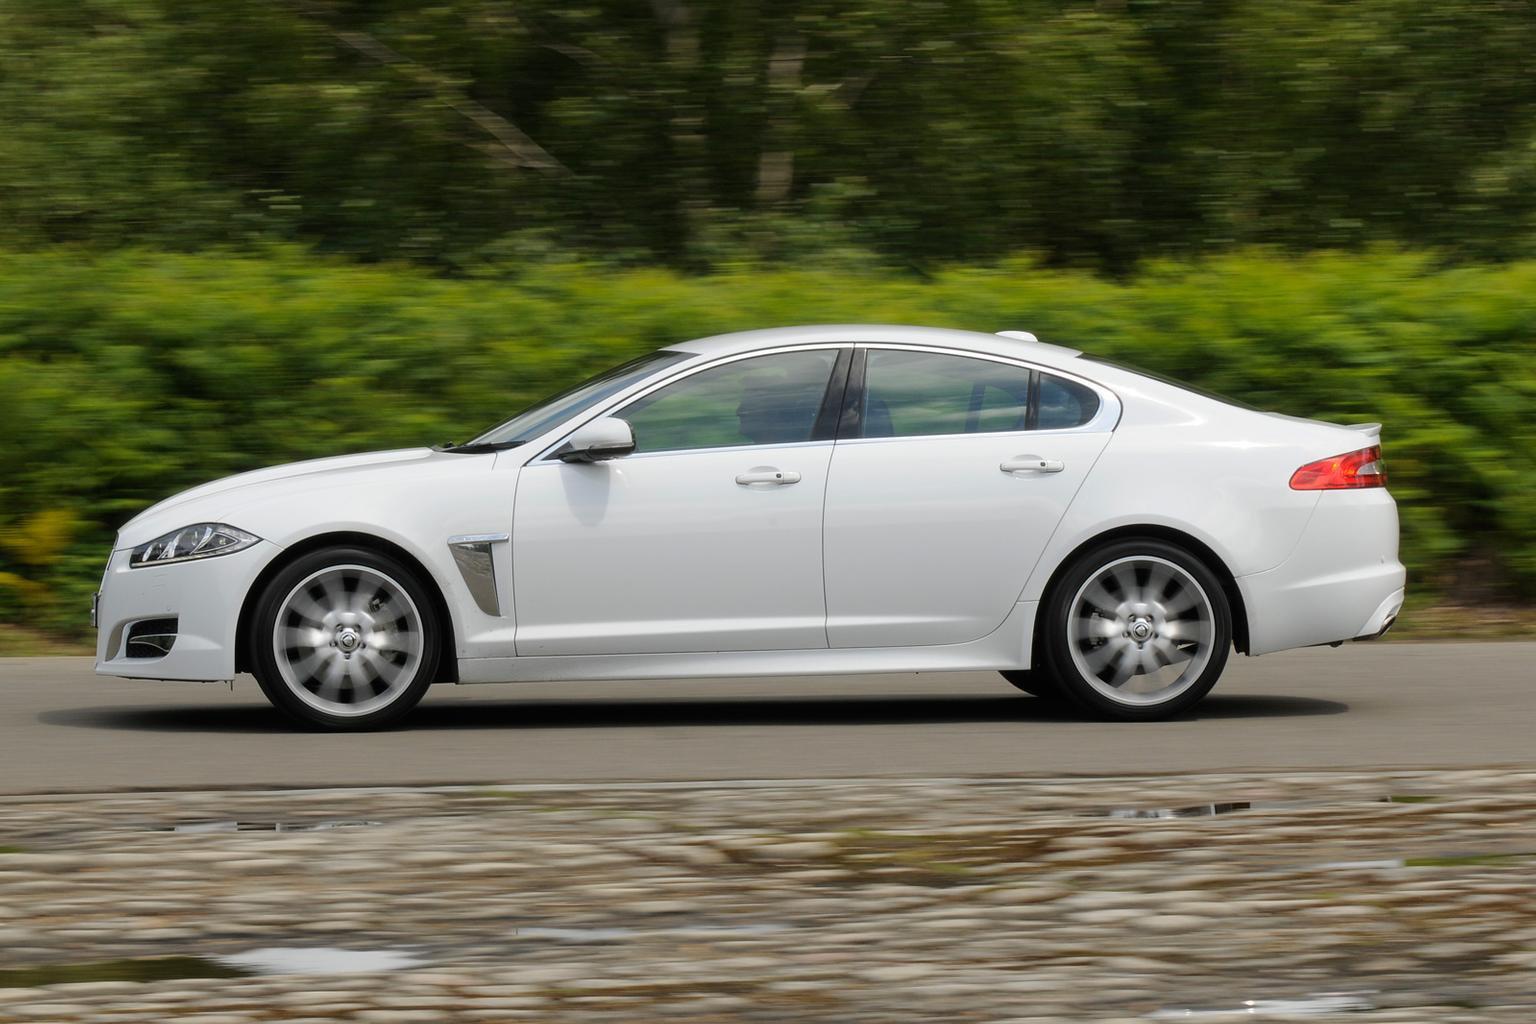 Jaguar XF savings available